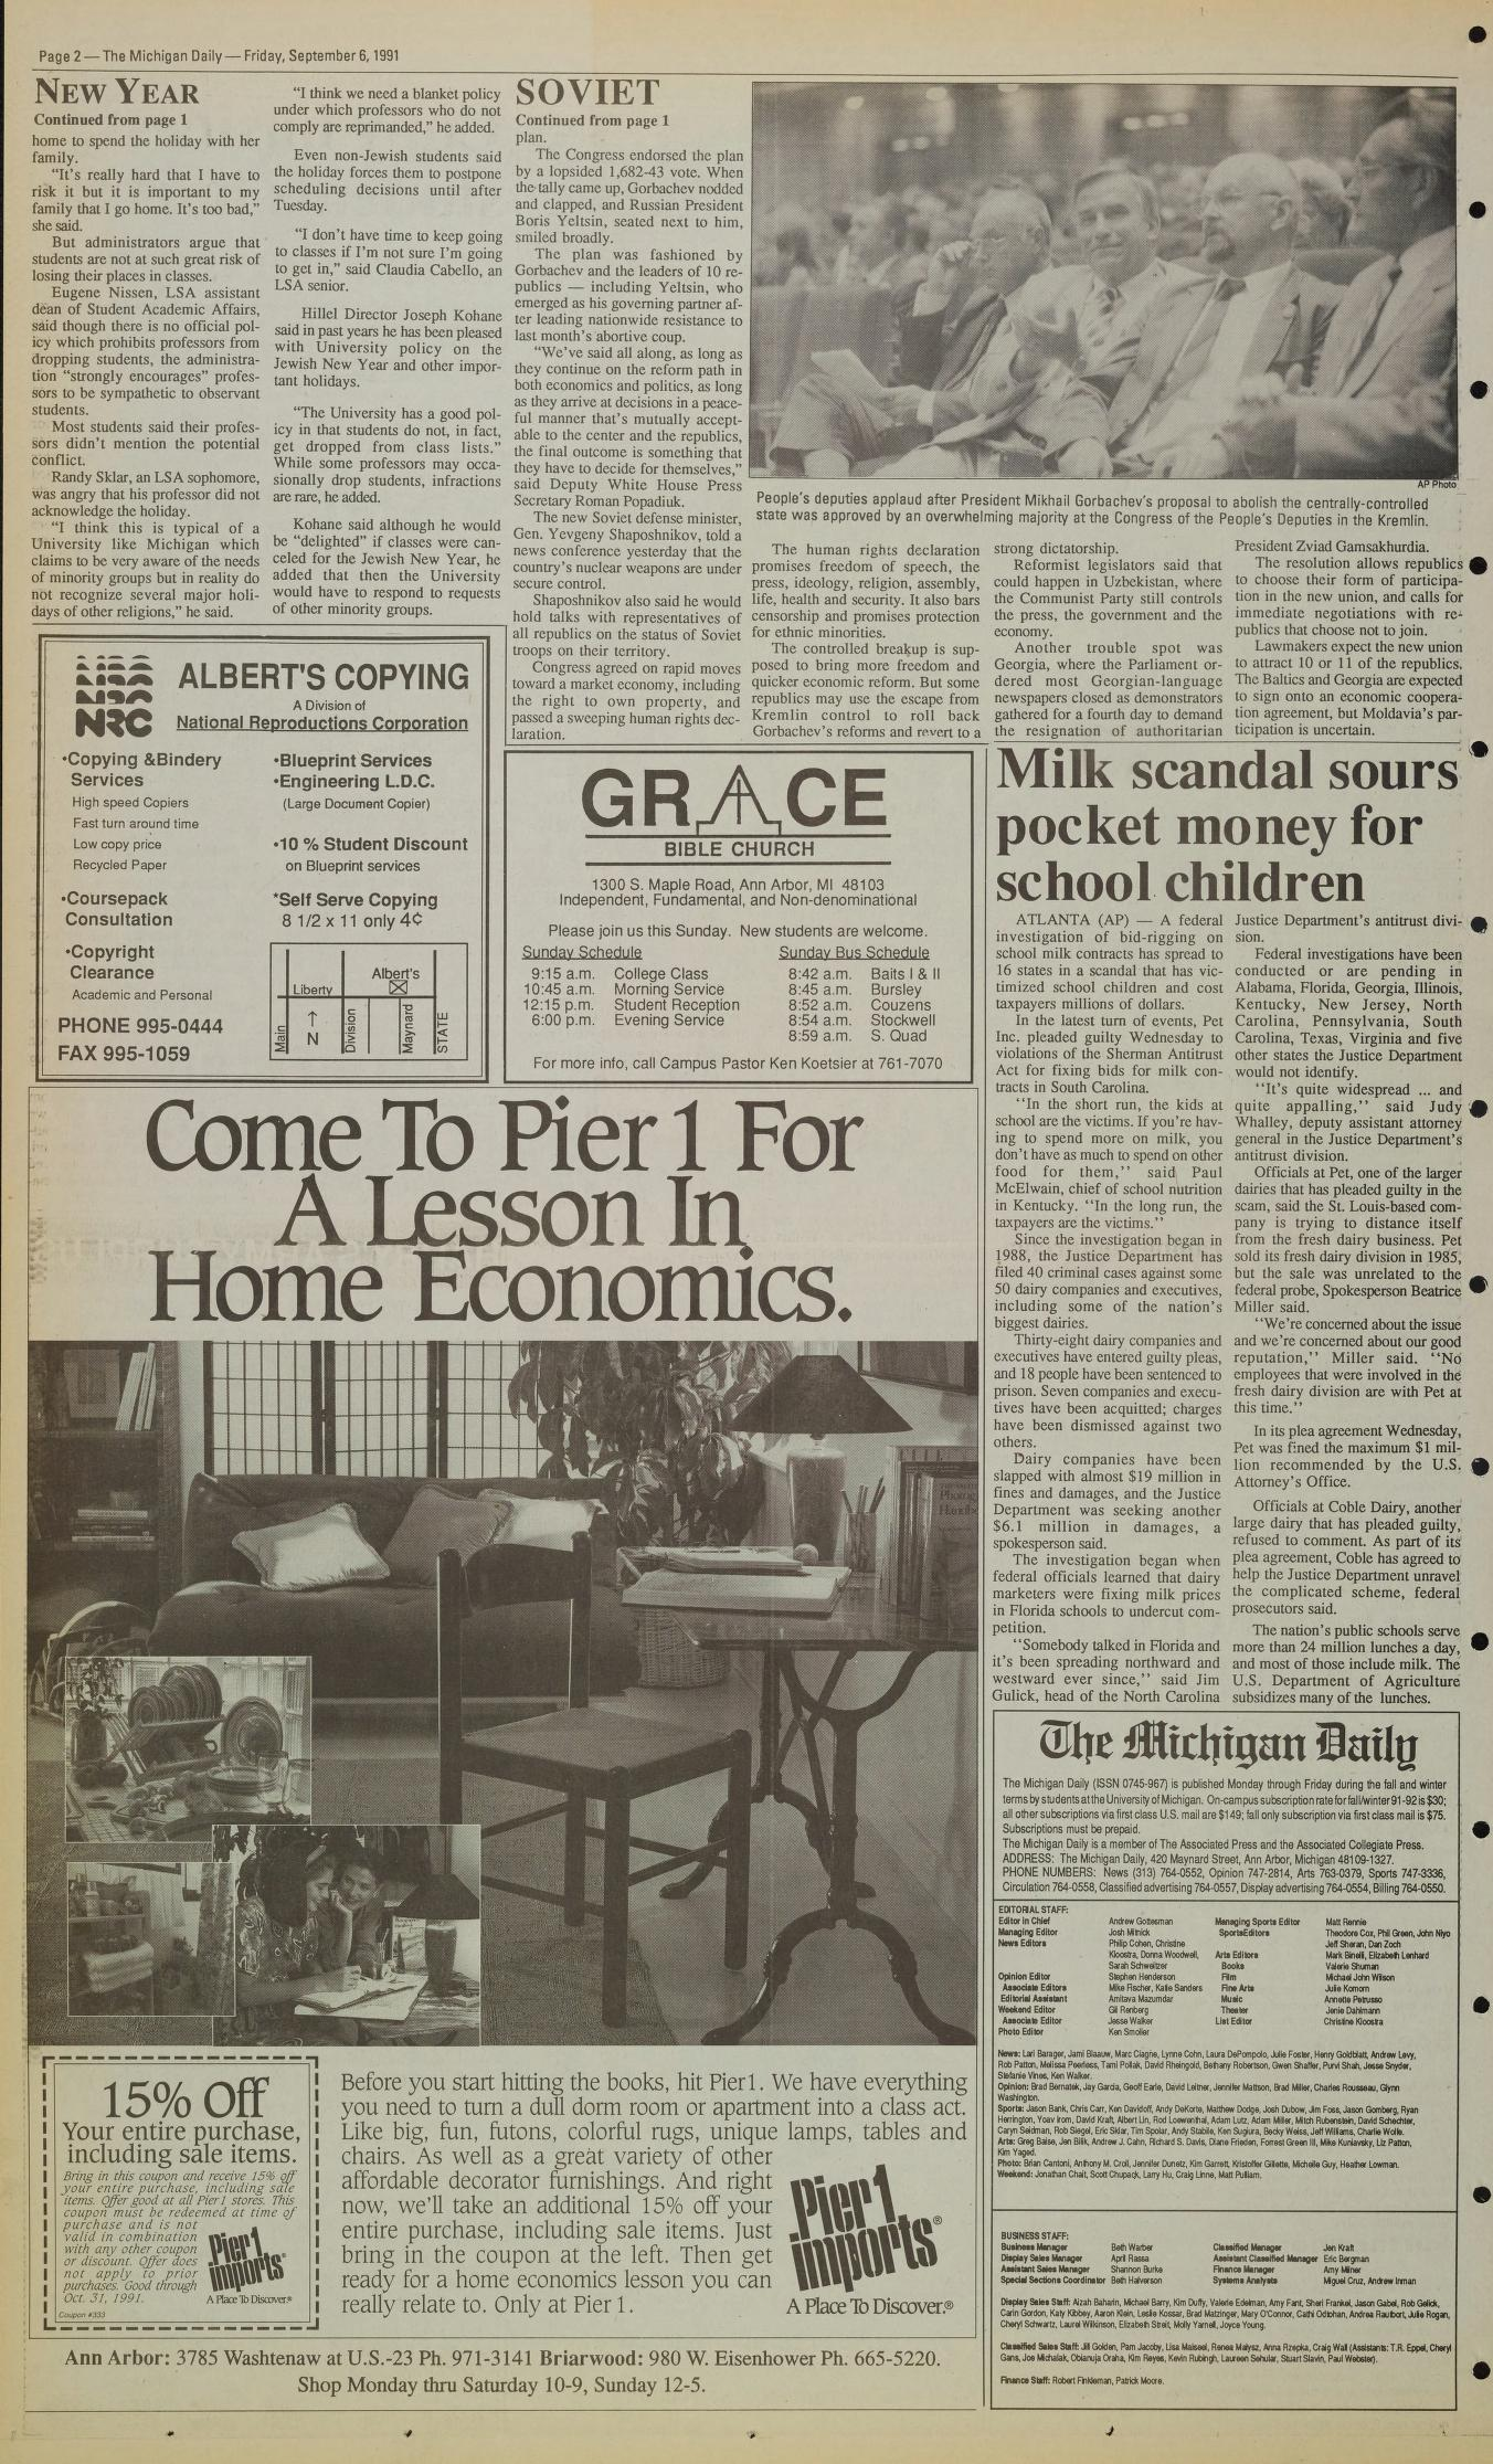 Michigan Daily Digital Archives - September 06, 1991 (vol